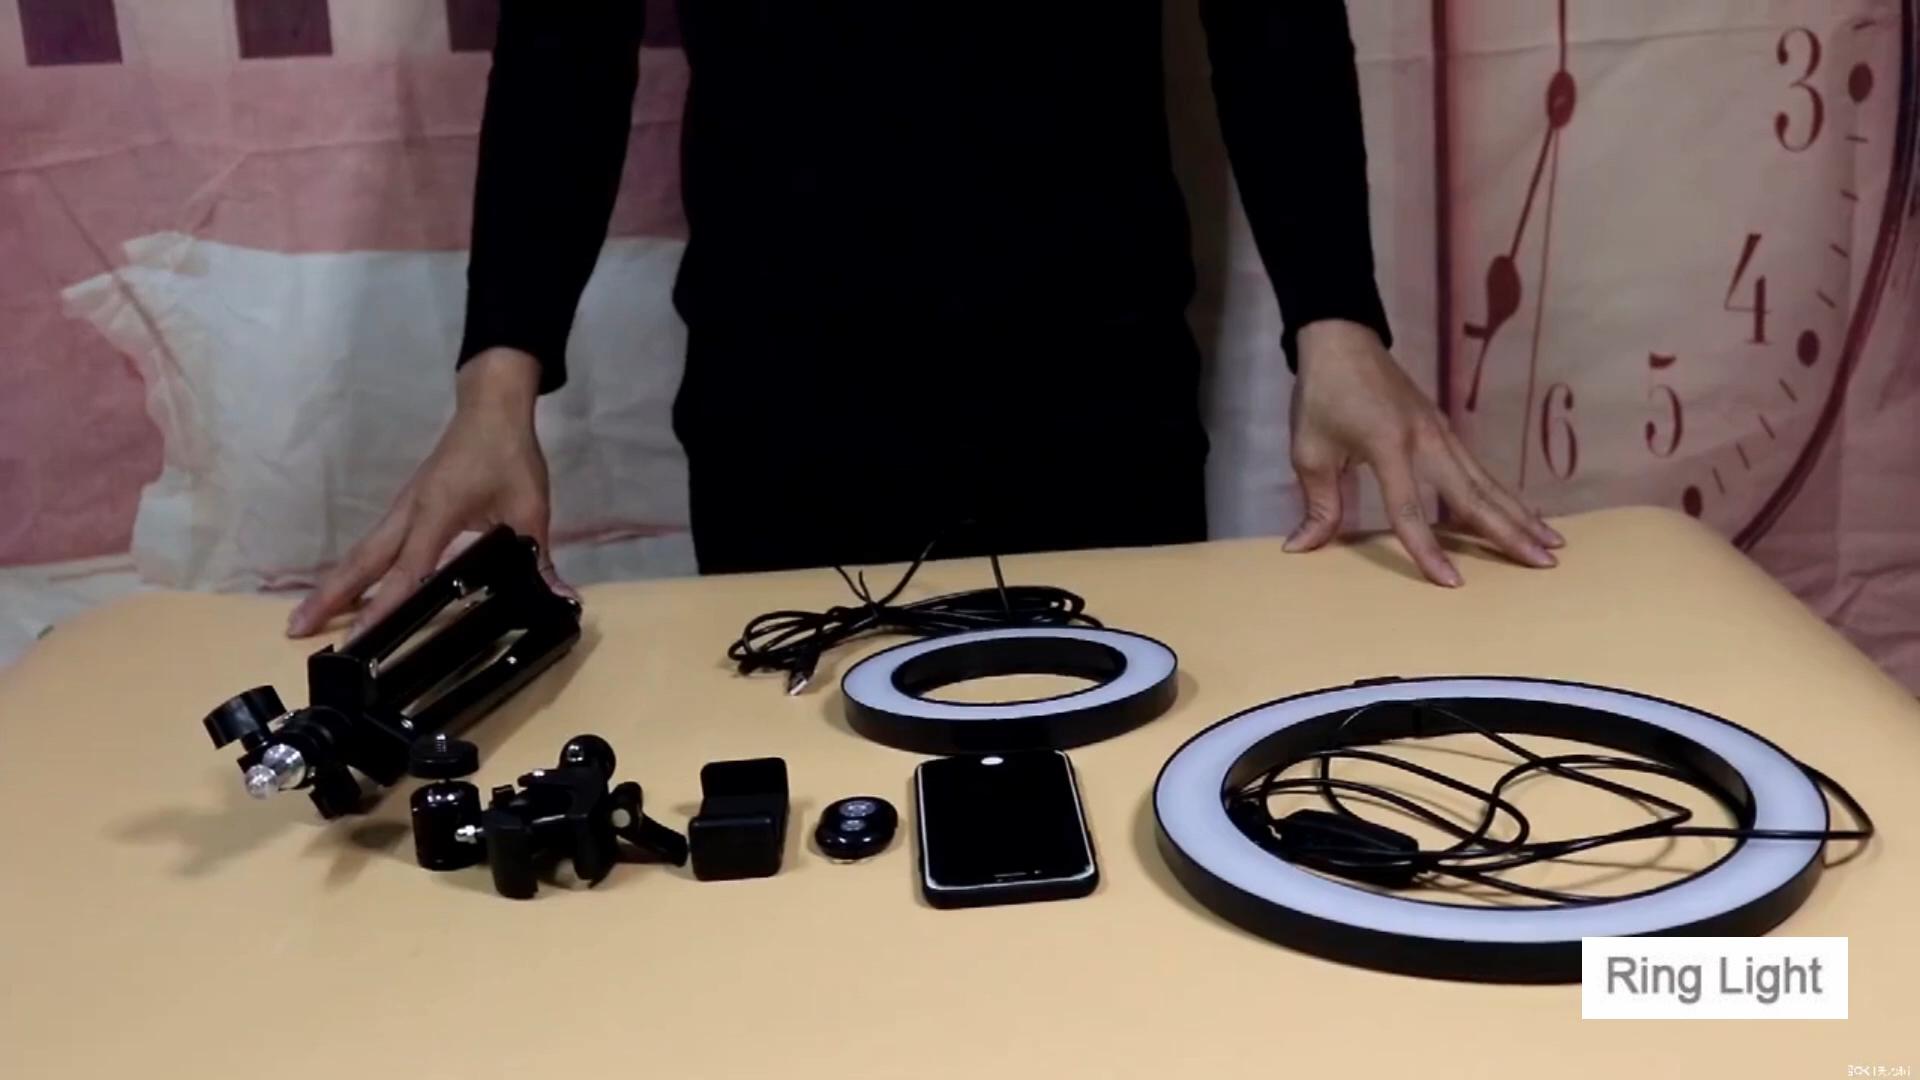 Dimmable טבעת LED מנורת סטודיו מצלמה טבעת אור תמונה טלפון וידאו אור מנורת עם חצובות Selfie מקל טבעת למלא אור